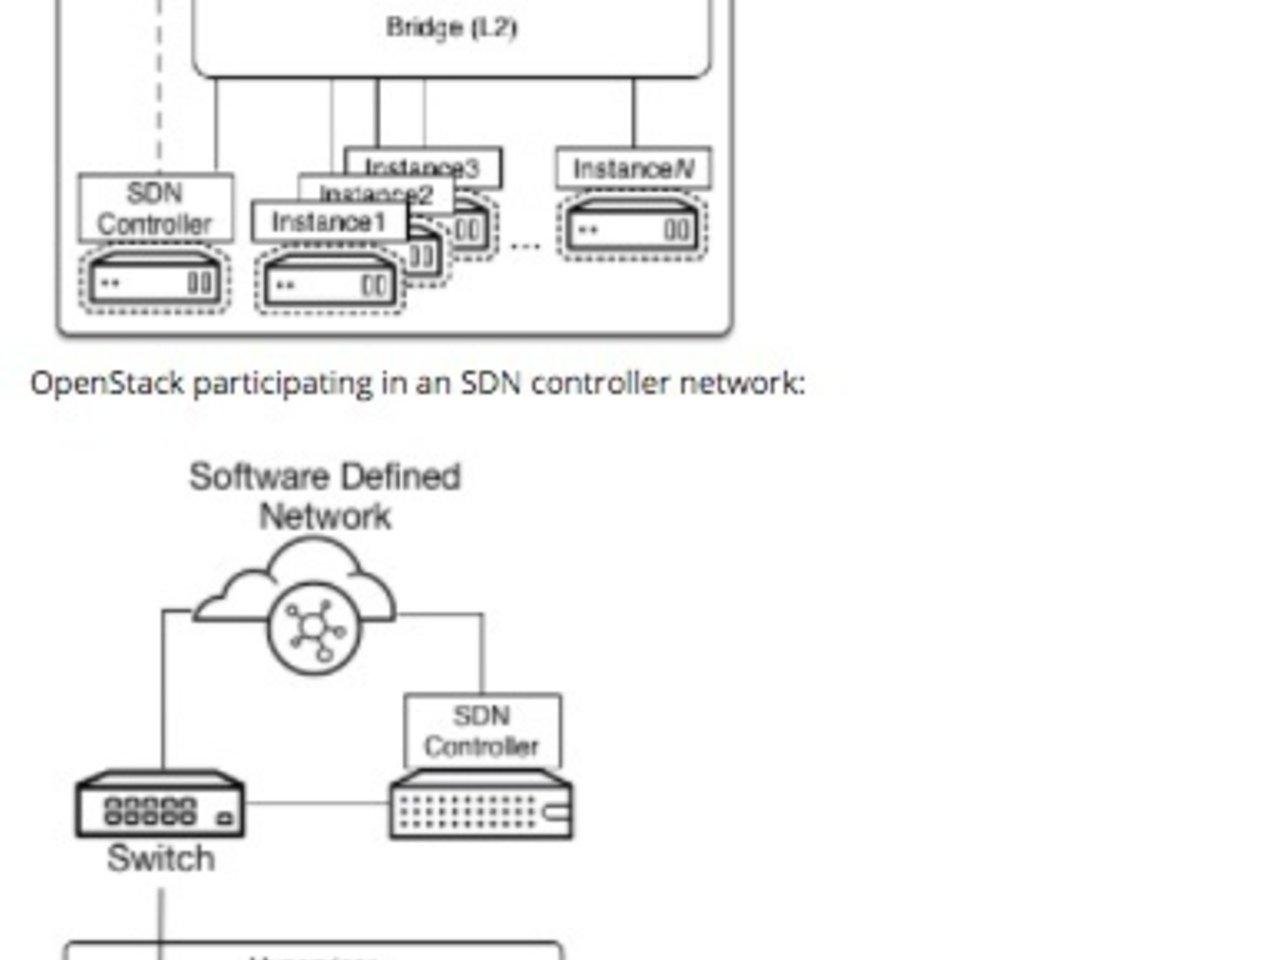 SDN Openstack